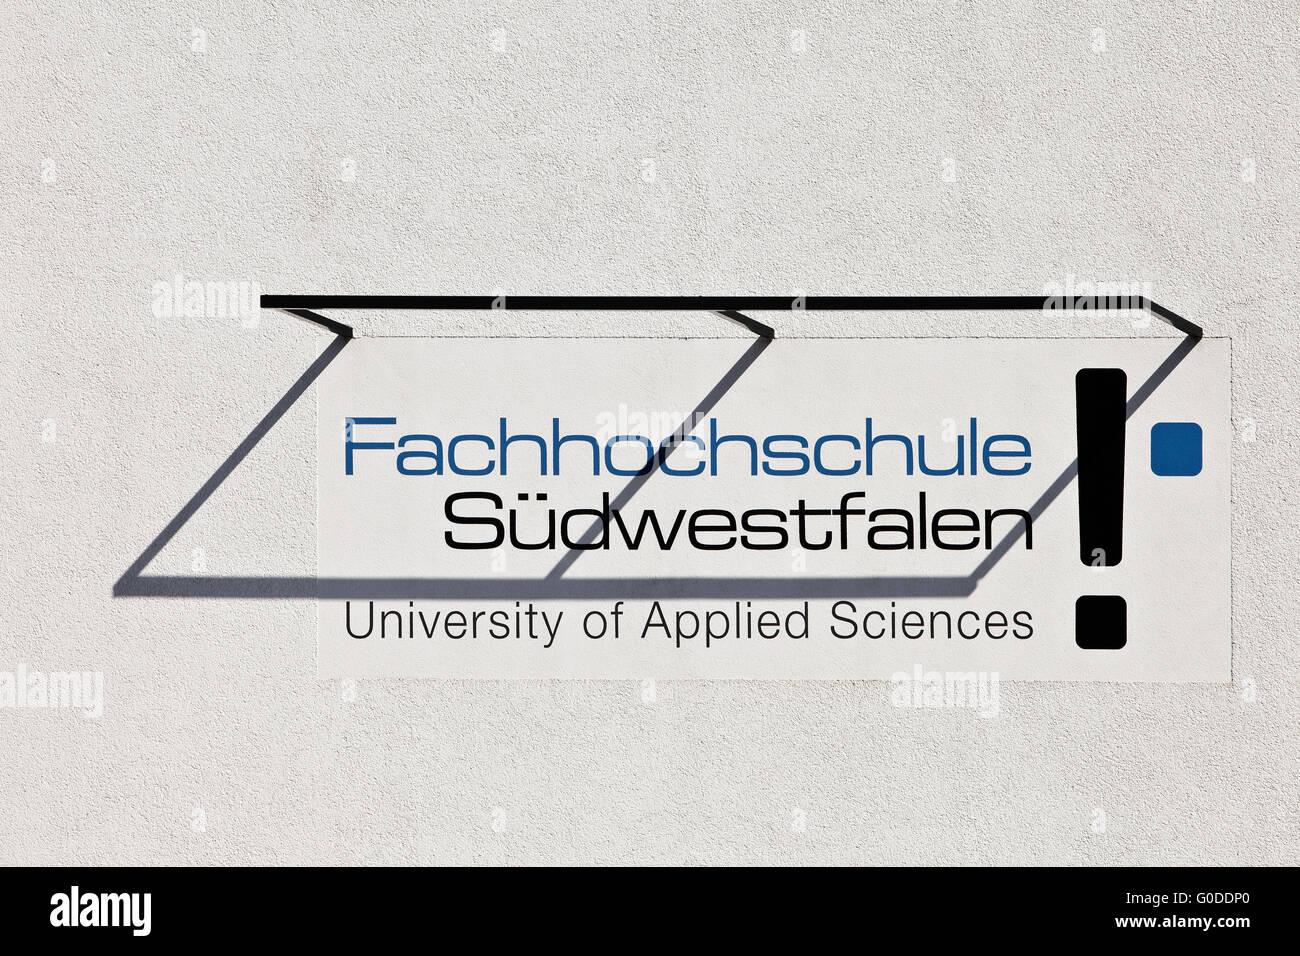 University of Applied Sciencesces Suedwestfalen - Stock Image